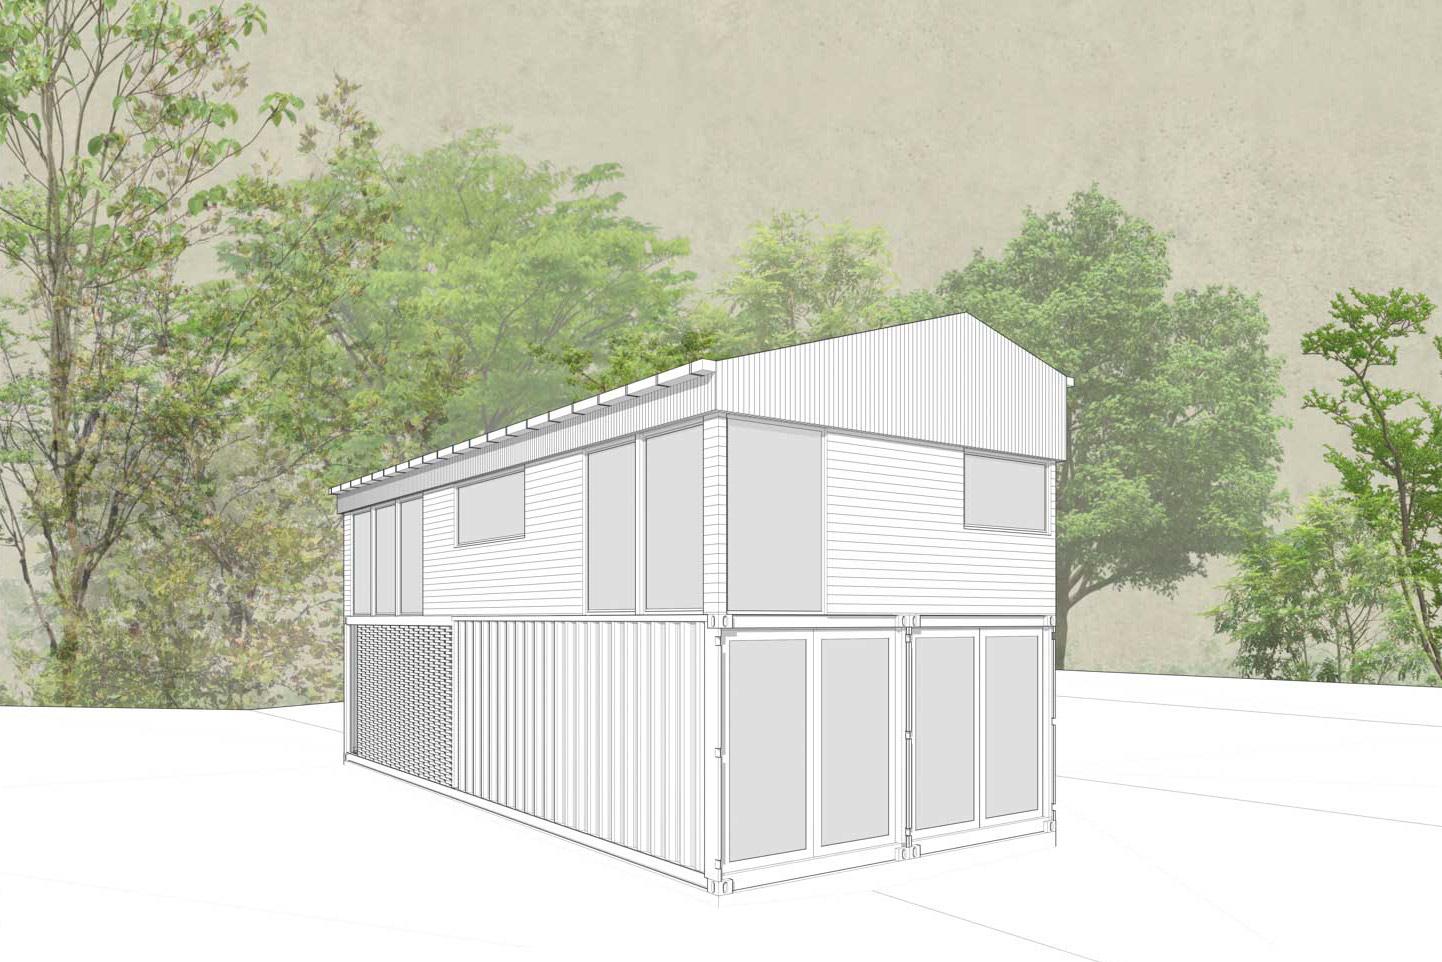 de kooning home 1 by Architecture Design Studio